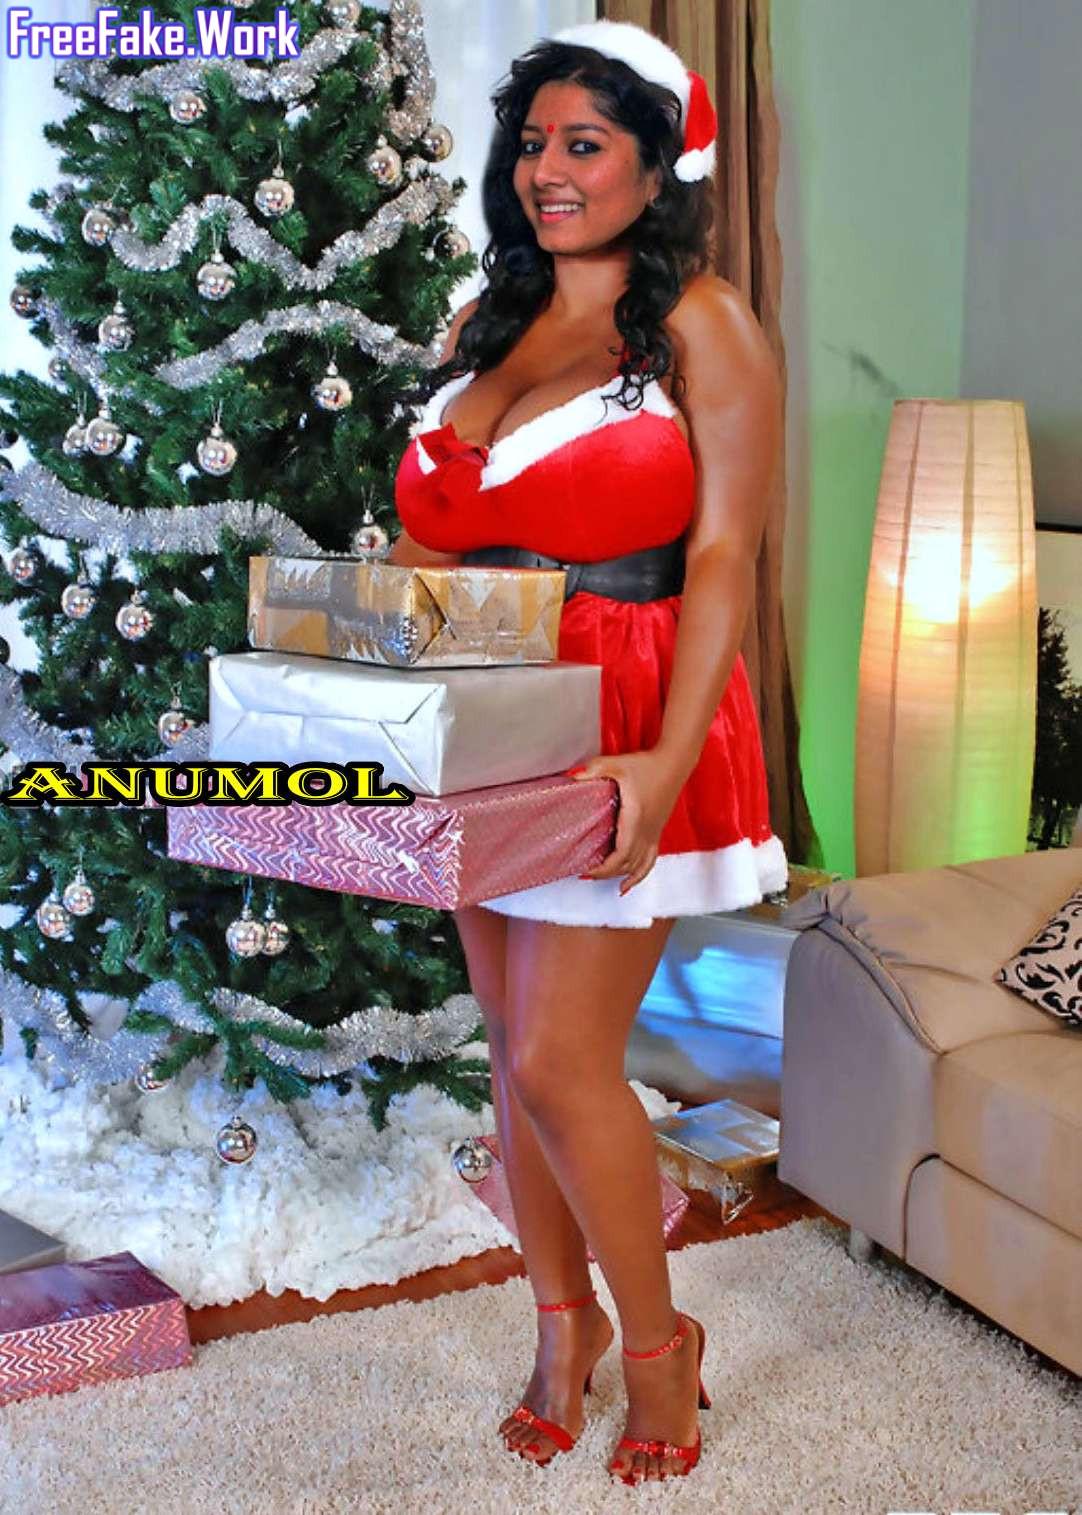 Anumol-sexy-leg-in-mini-skirt-Christmas-special.jpg